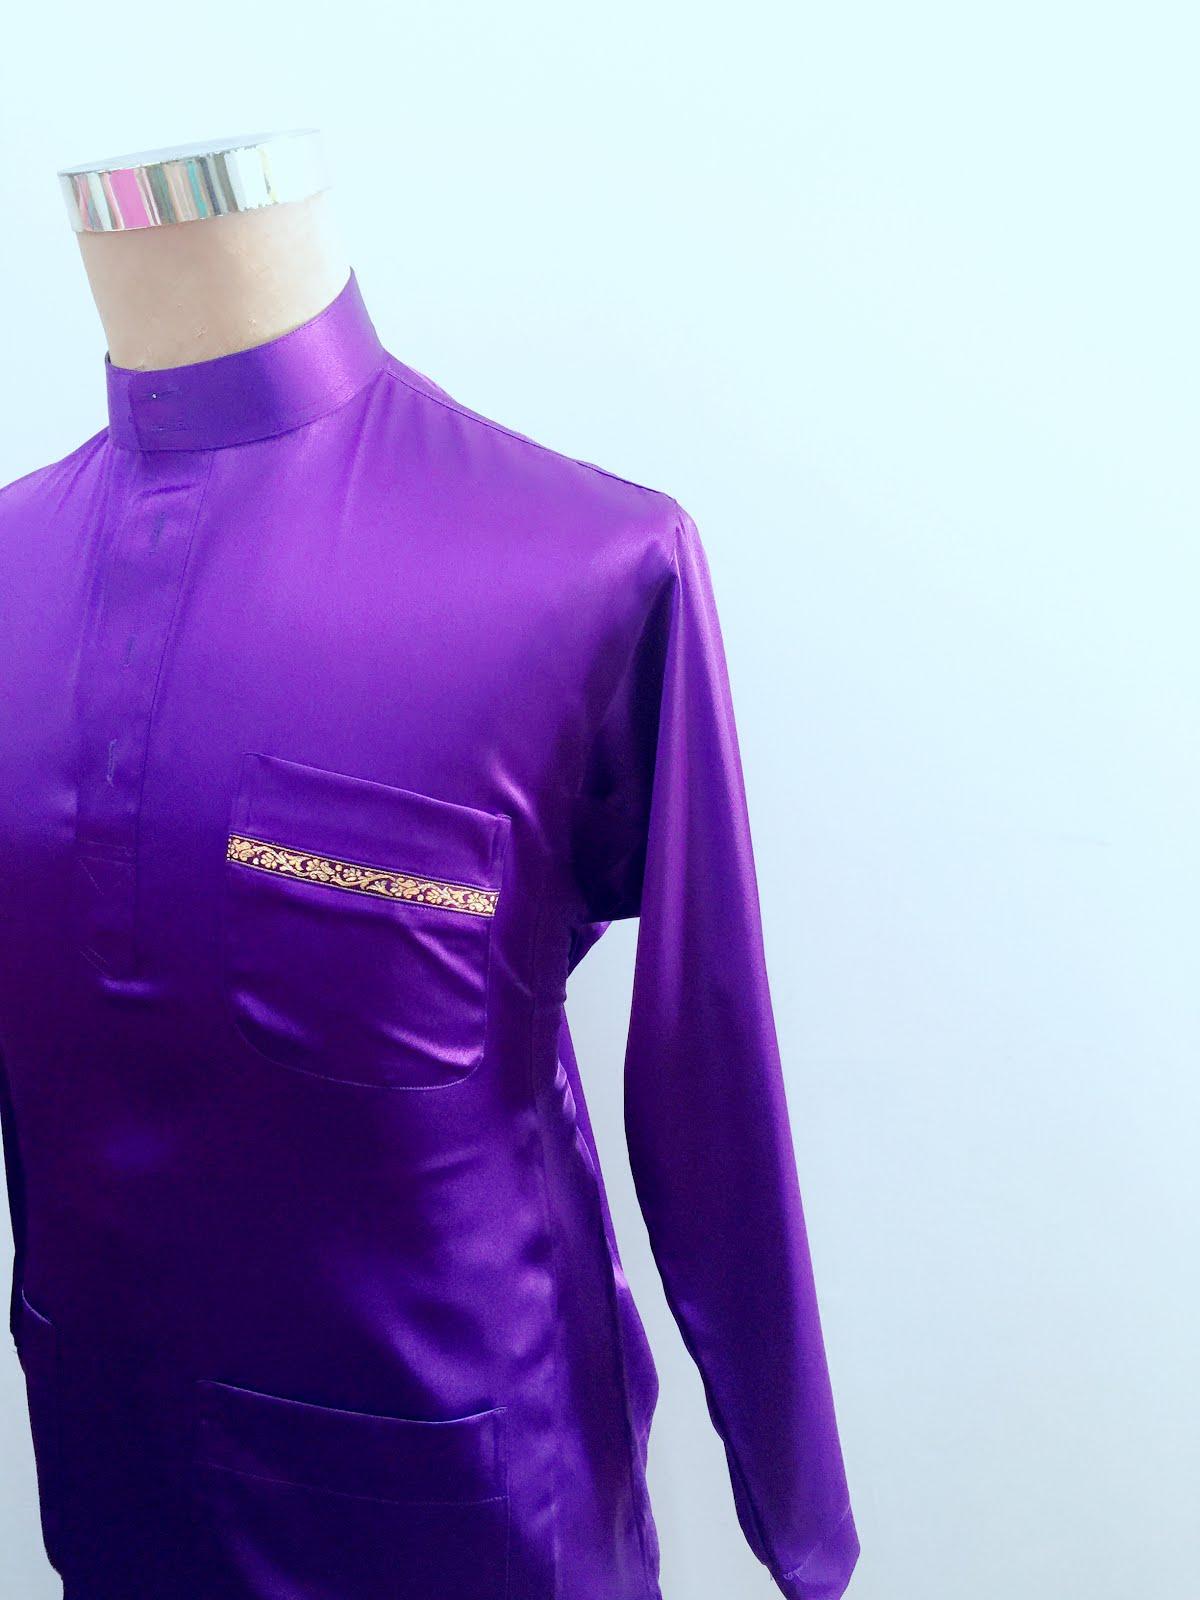 Coollection Baju Melayu Cekak Musang